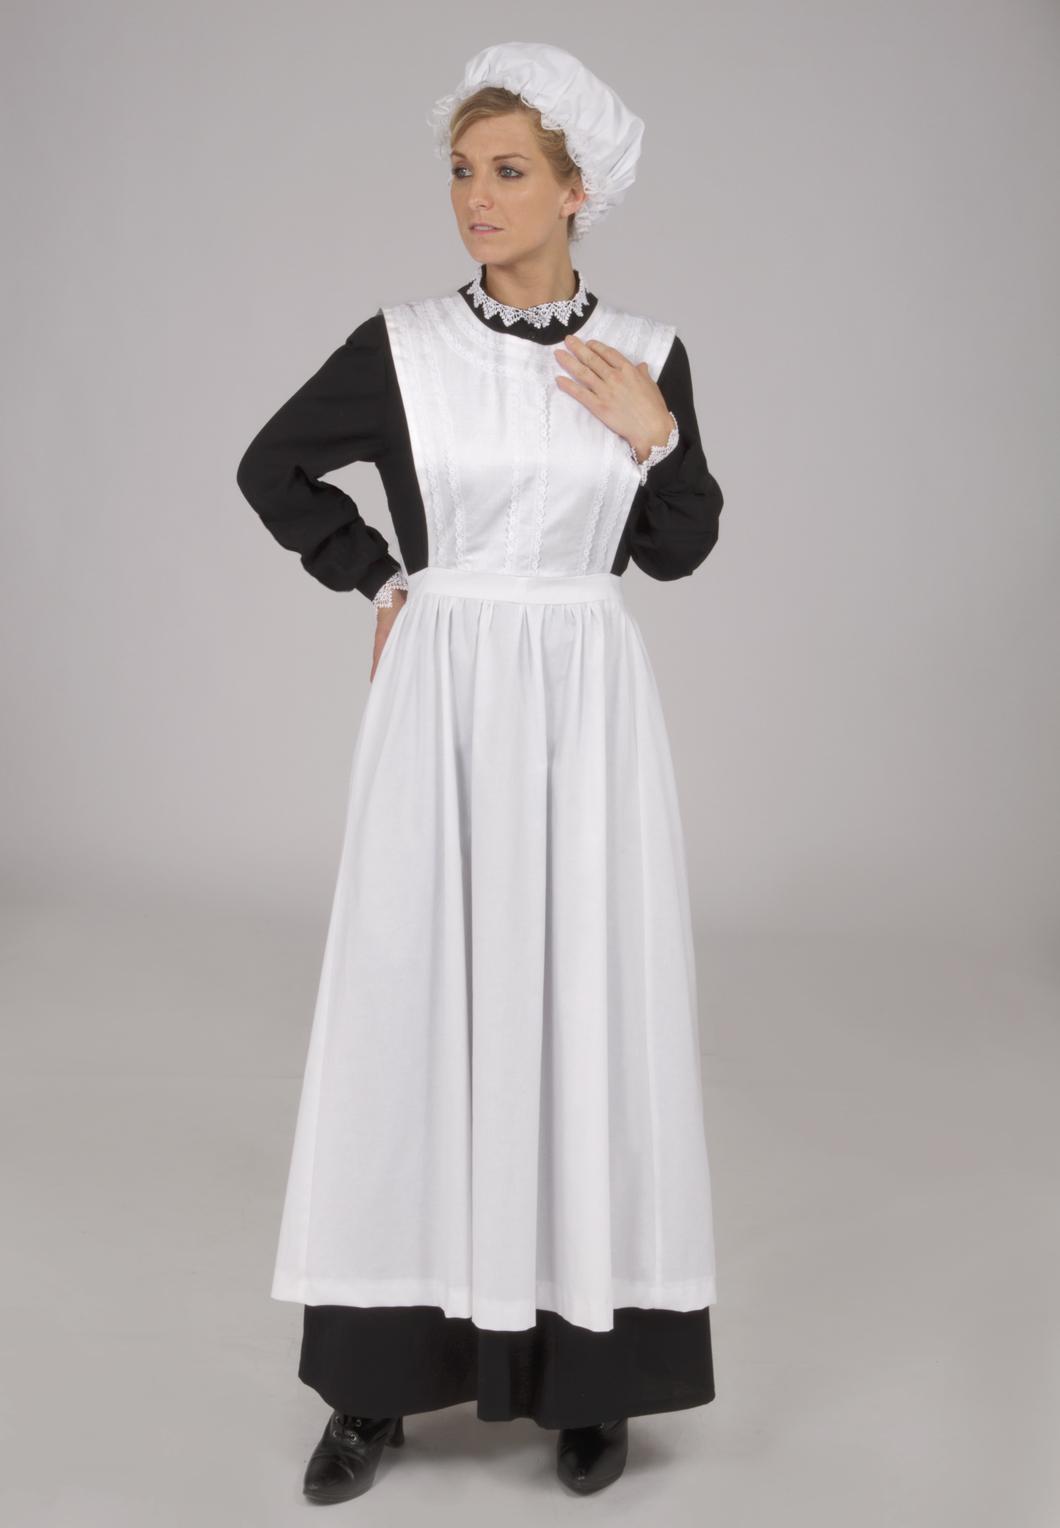 Edwardian white apron - Agatha Downton Abbey Styled Maid S Uniform 159 95 Marta Edwardian Blouse